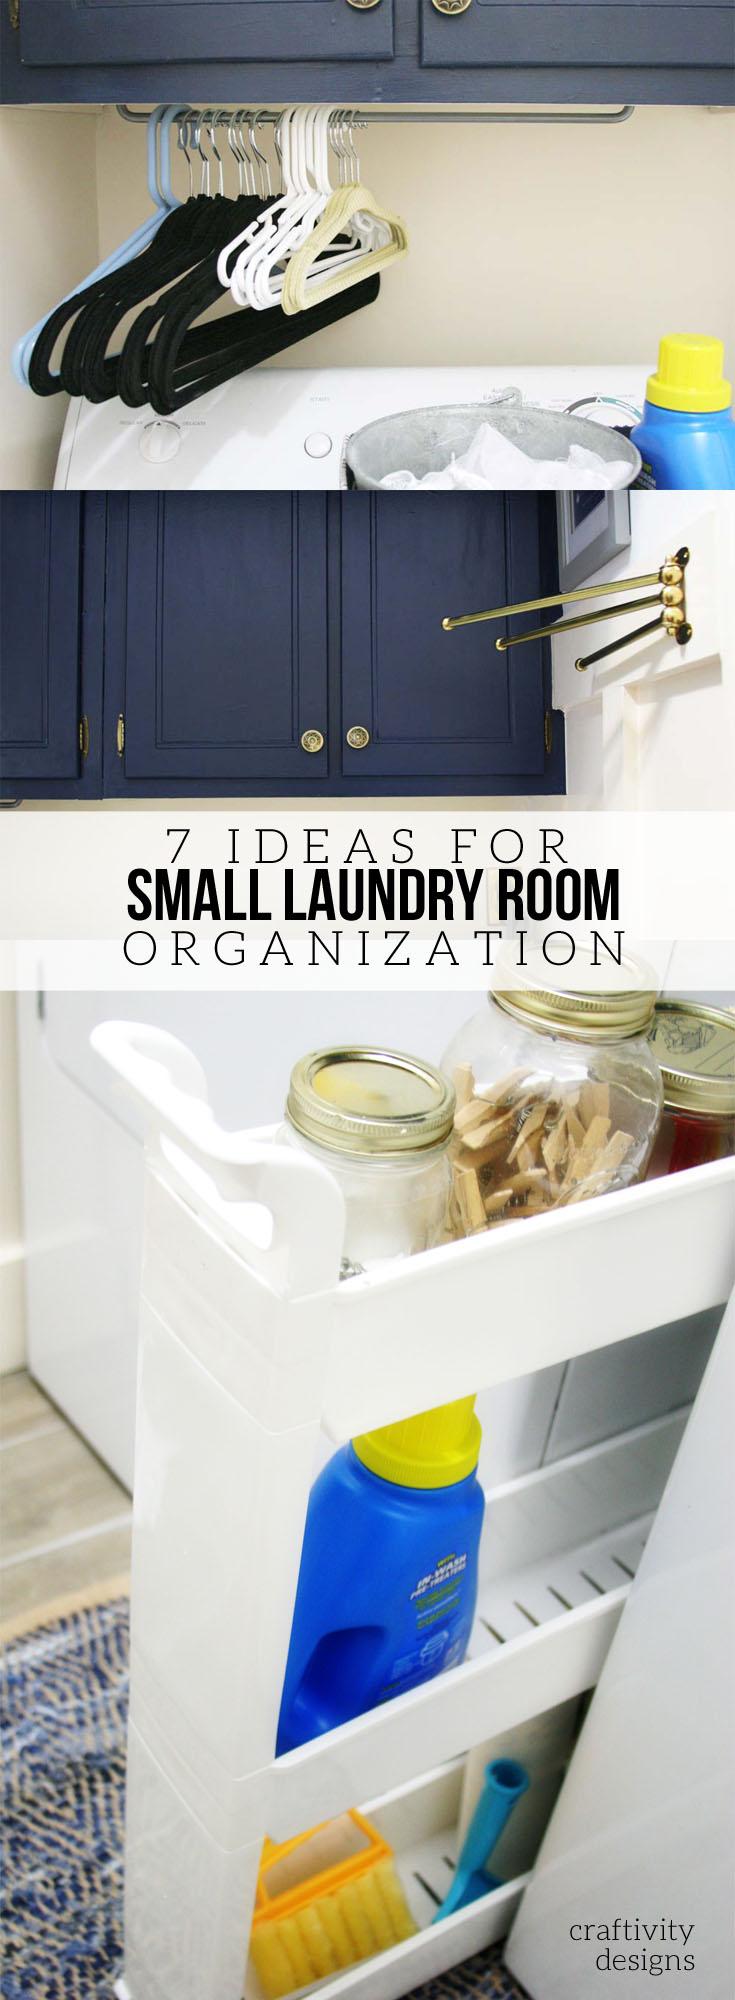 7 Tiny Laundry Room Storage Ideas (that are cheap ... on Small Laundry Room Organization Ideas  id=73111